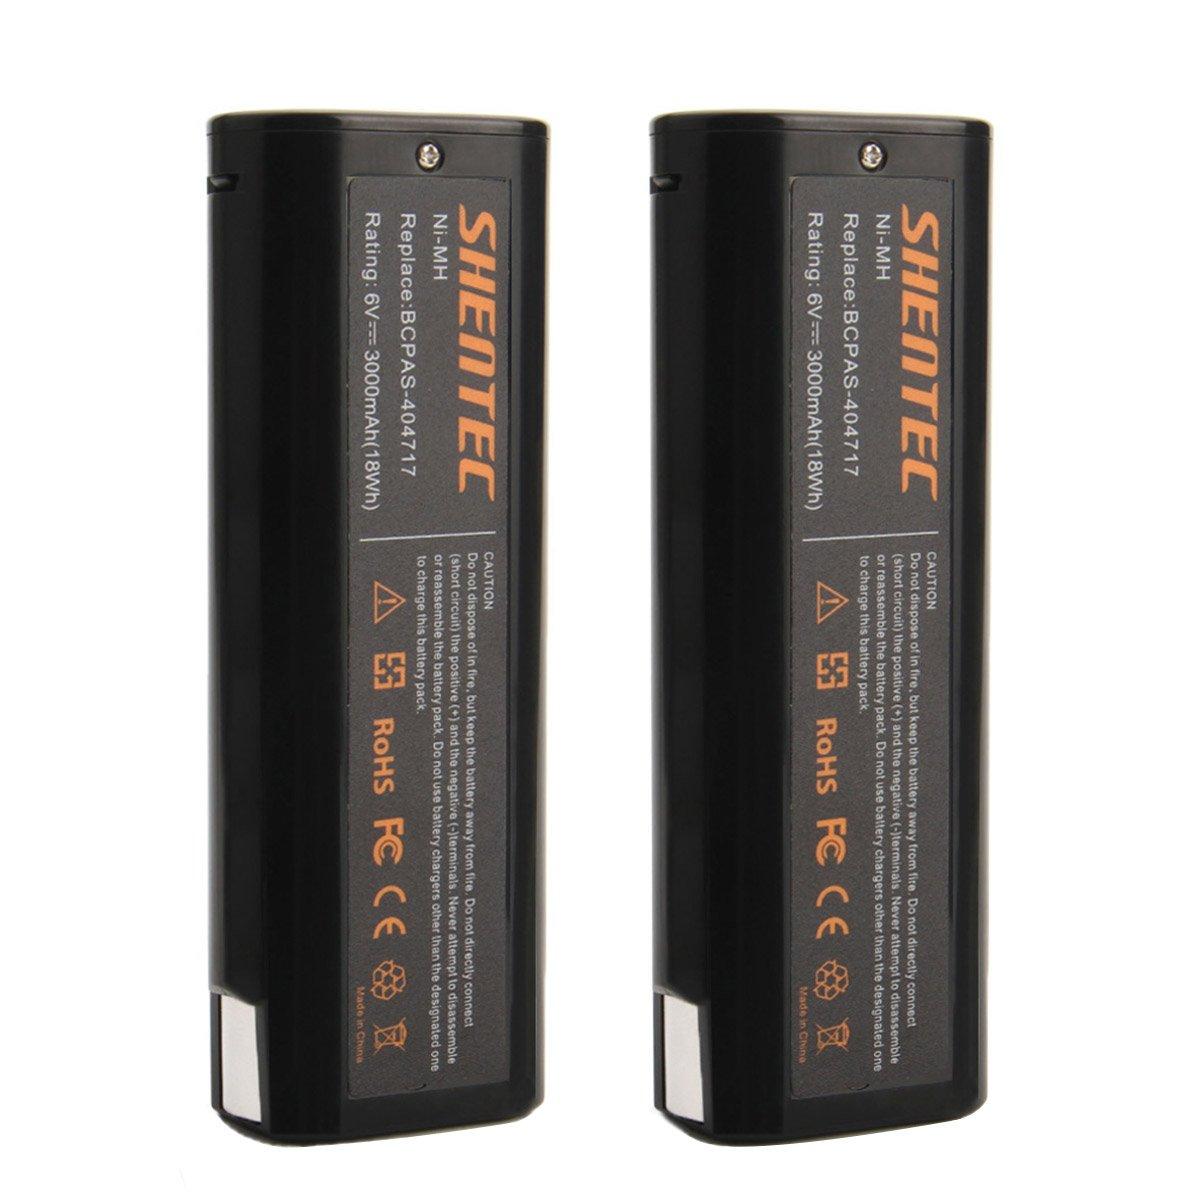 Shentec 2pcs 3.0Ah 6V Replacement Battery Compatible with Paslode 404717 B20544E BCPAS-404717 404400 900400 900420 900421 900600 901000 902000 B20720 CF-325 IM200 F18 IM250 IM250A IM350A PS604N, Ni-MH